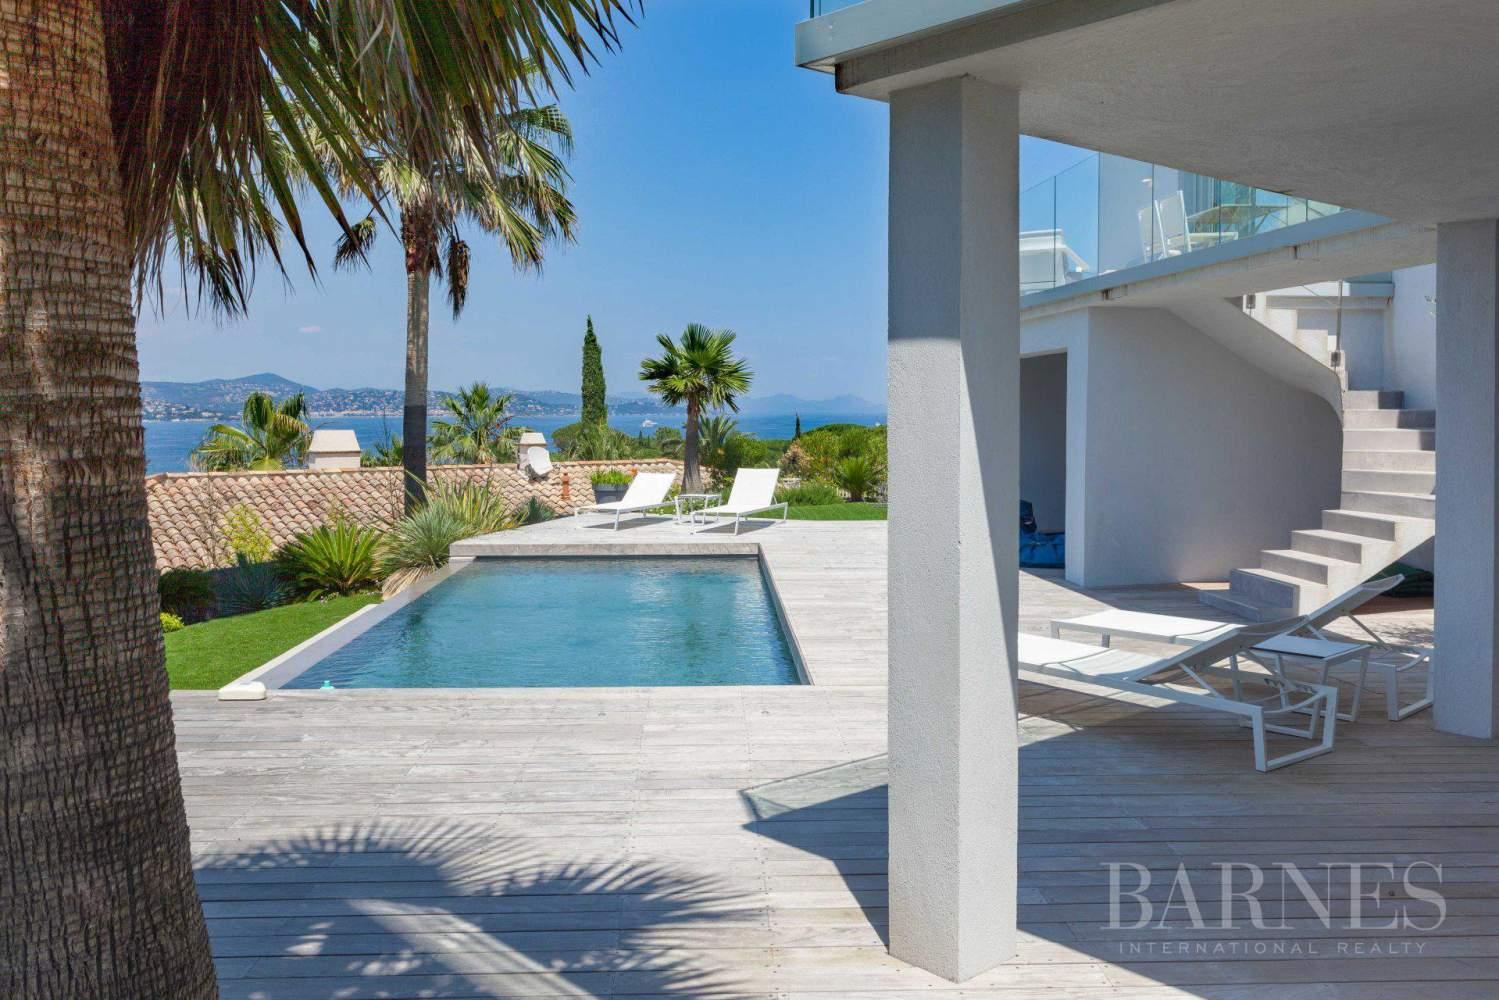 GASSIN - Contemporary house near Saint-Tropez, sea view picture 1